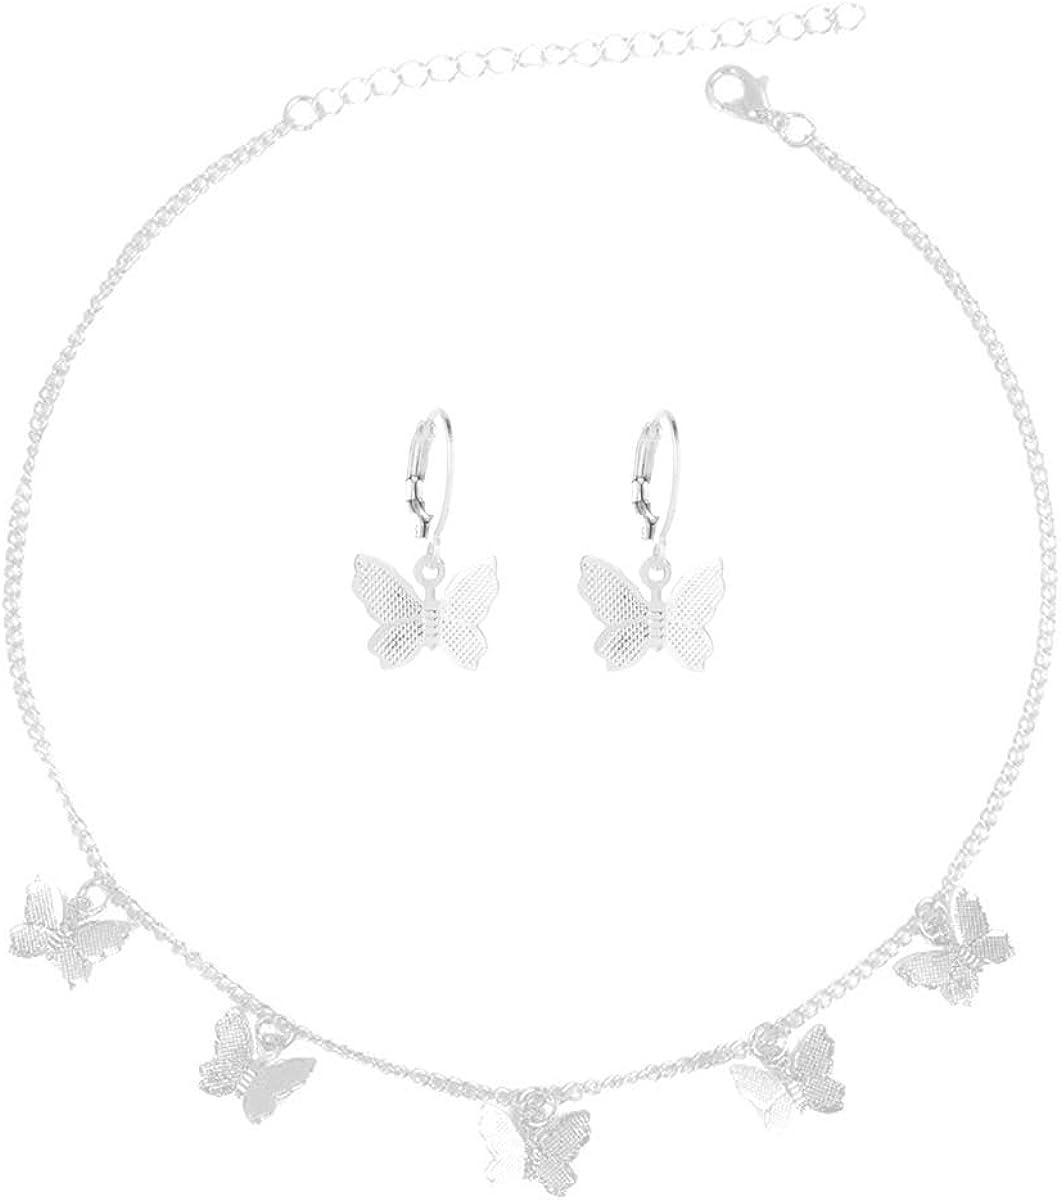 2-4 Pcs Butterfly Necklace Earrings Set Adjustable Butterfly Star Pearl Chain Necklace Charm Hoop Earrings Jewelry for Women Girls